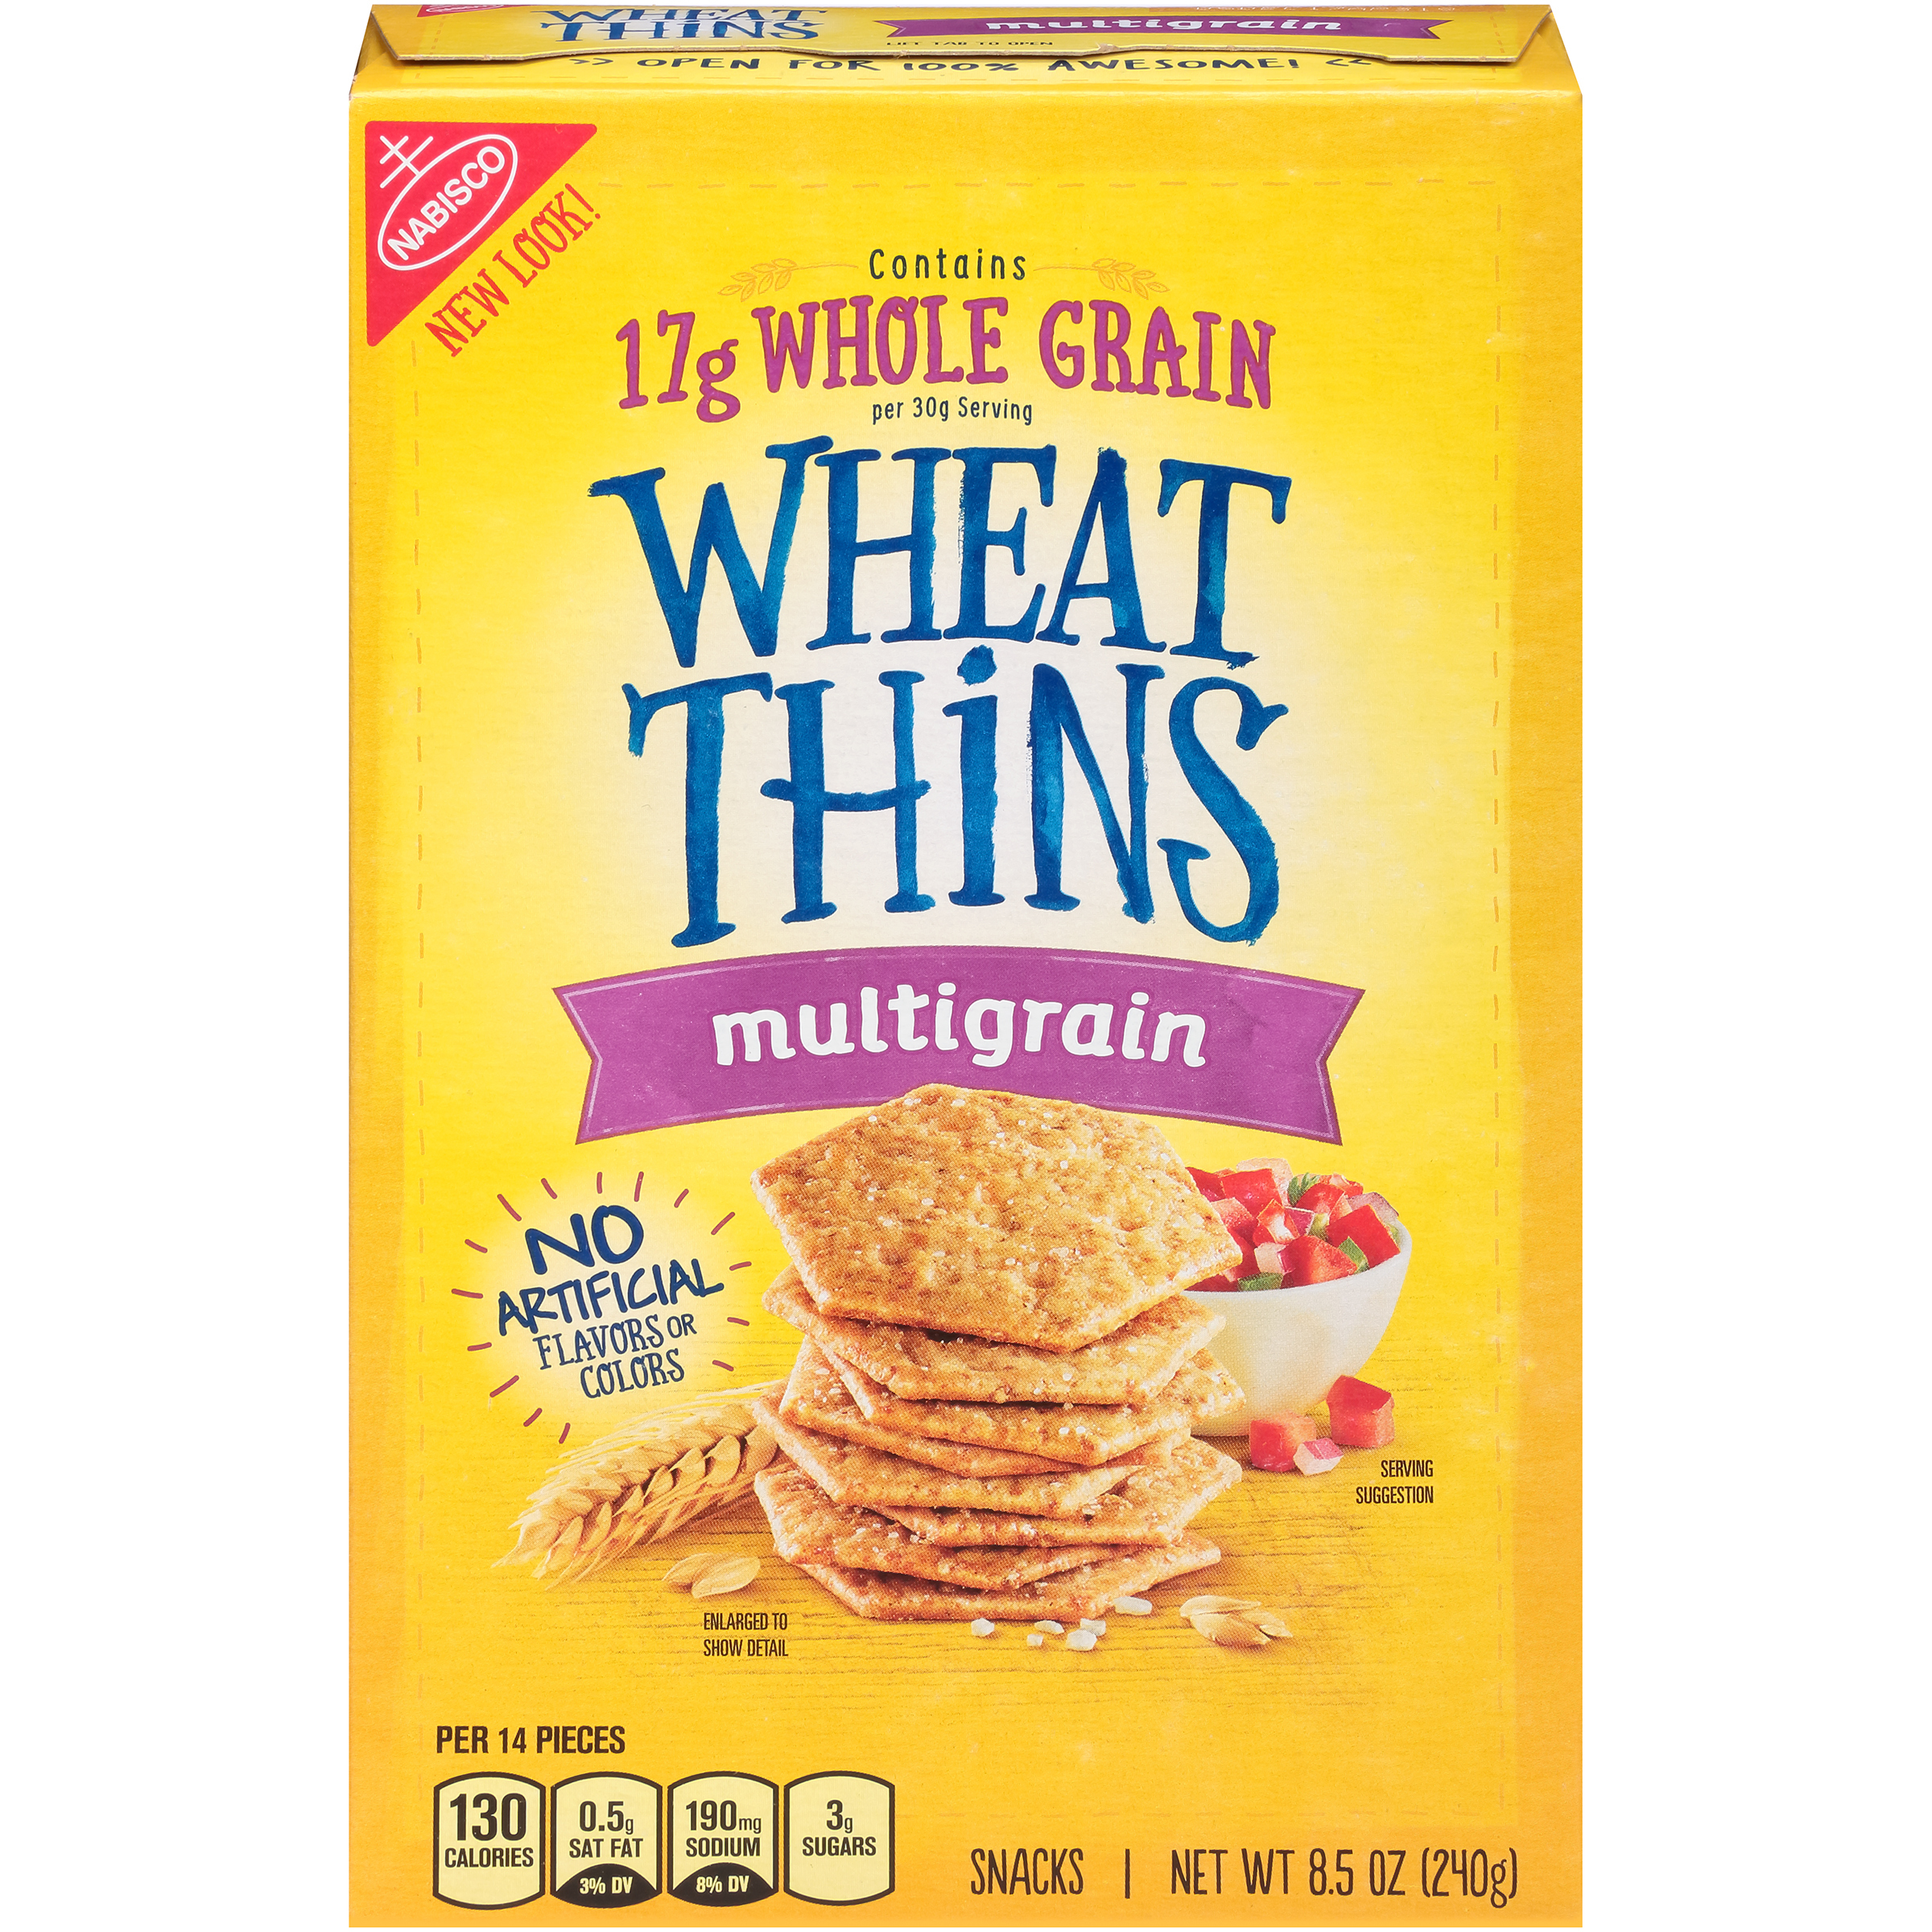 WHEAT THINS Multigrain Crackers 8.5 oz